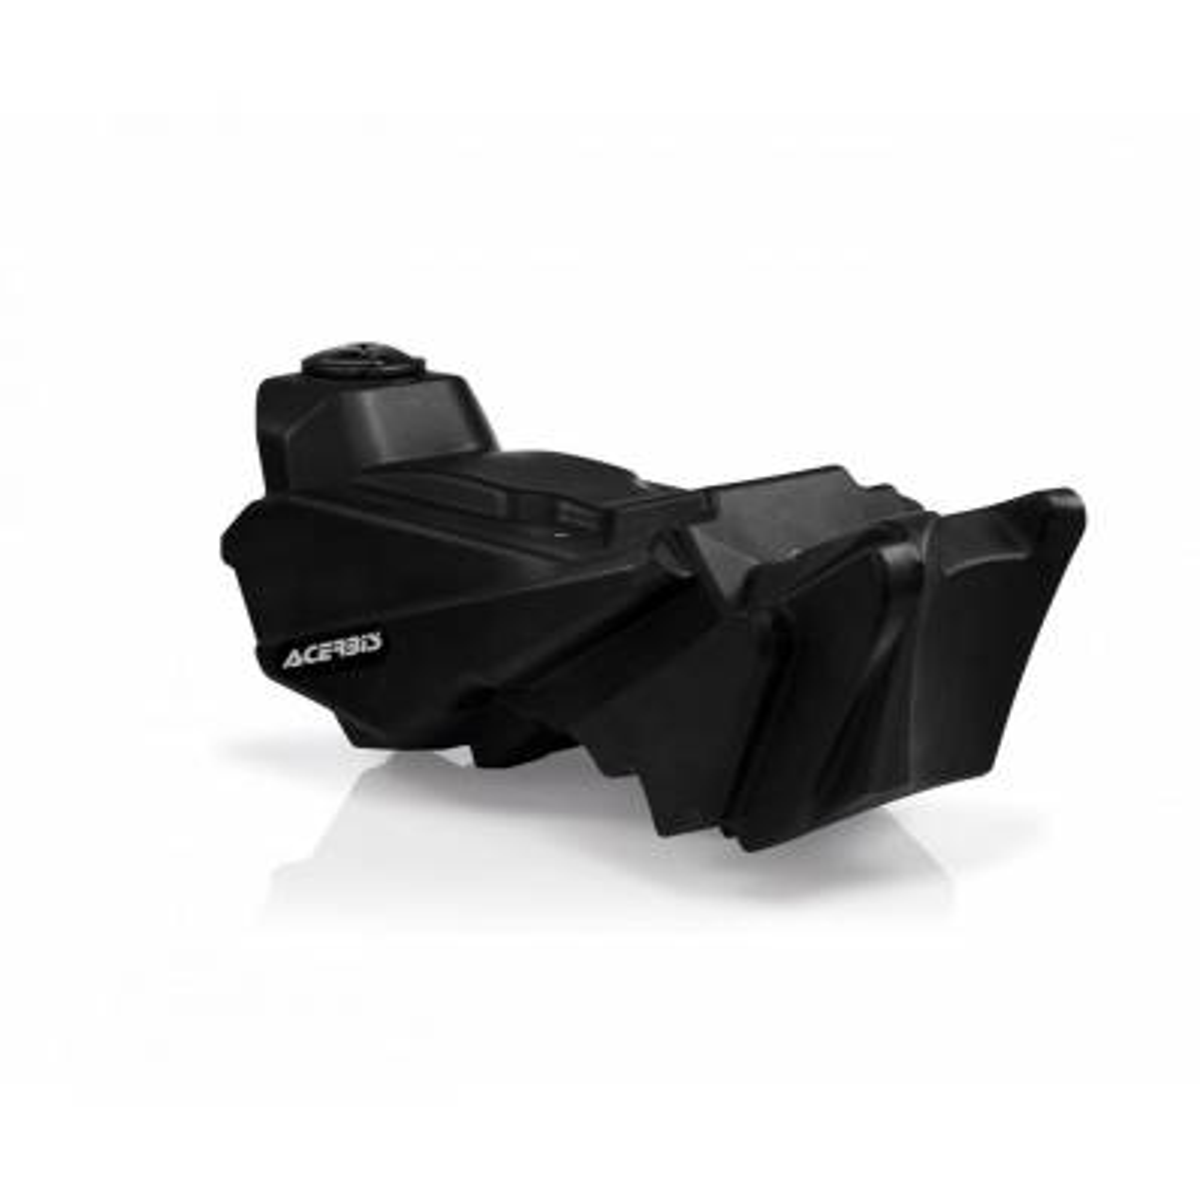 0017586-090 - Deposito Acerbis Yamaha Yzf Wrf 250 450 14 15 11.3 Litros Negro